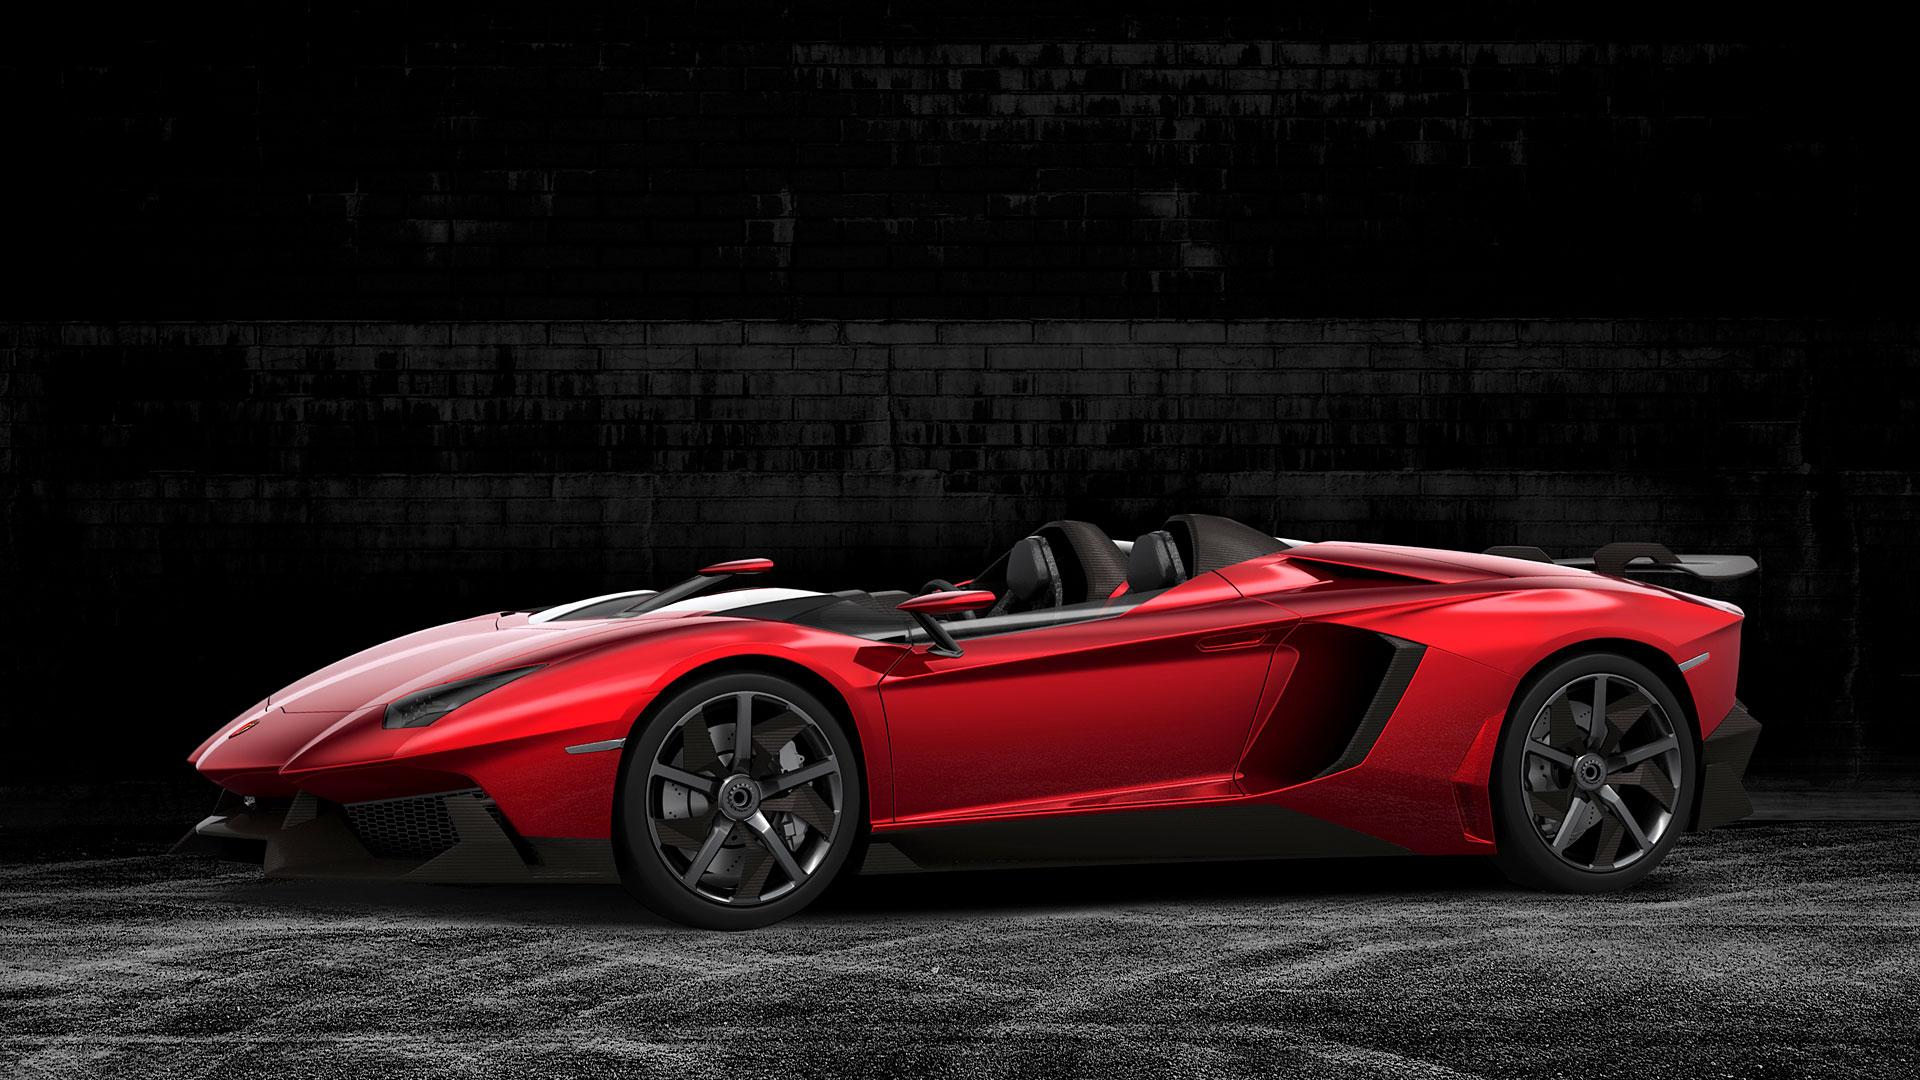 Lamborghini Aventador J-สวยงาม